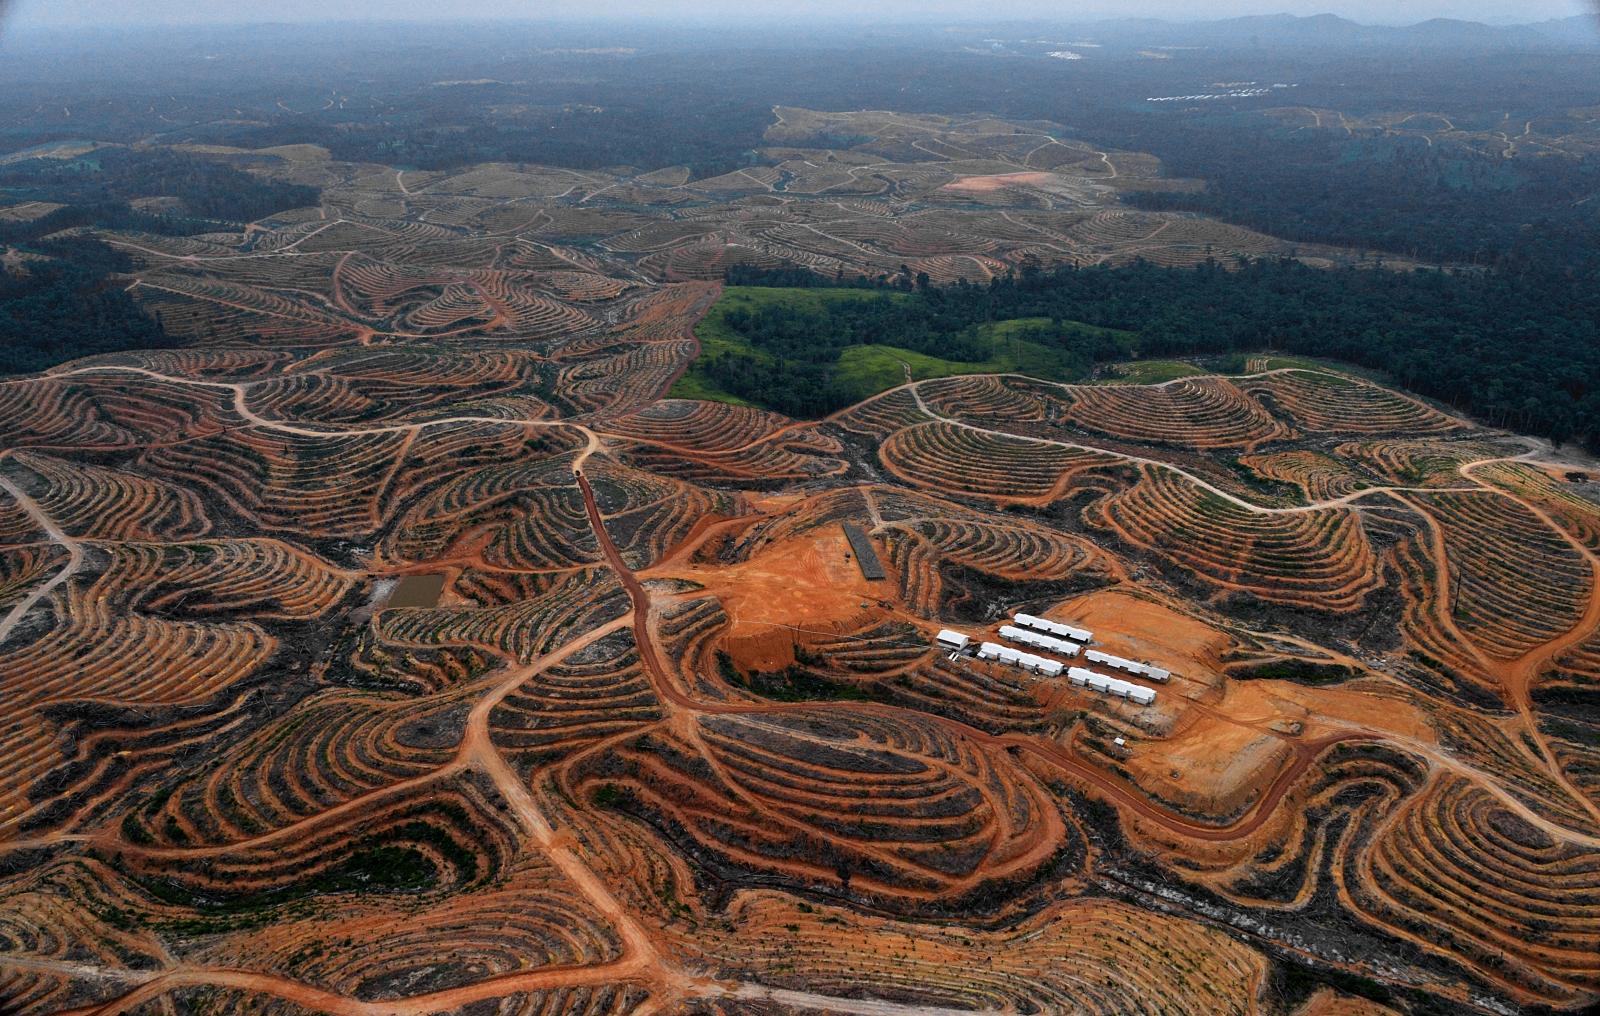 borneo-deforestation-palm-oil-2